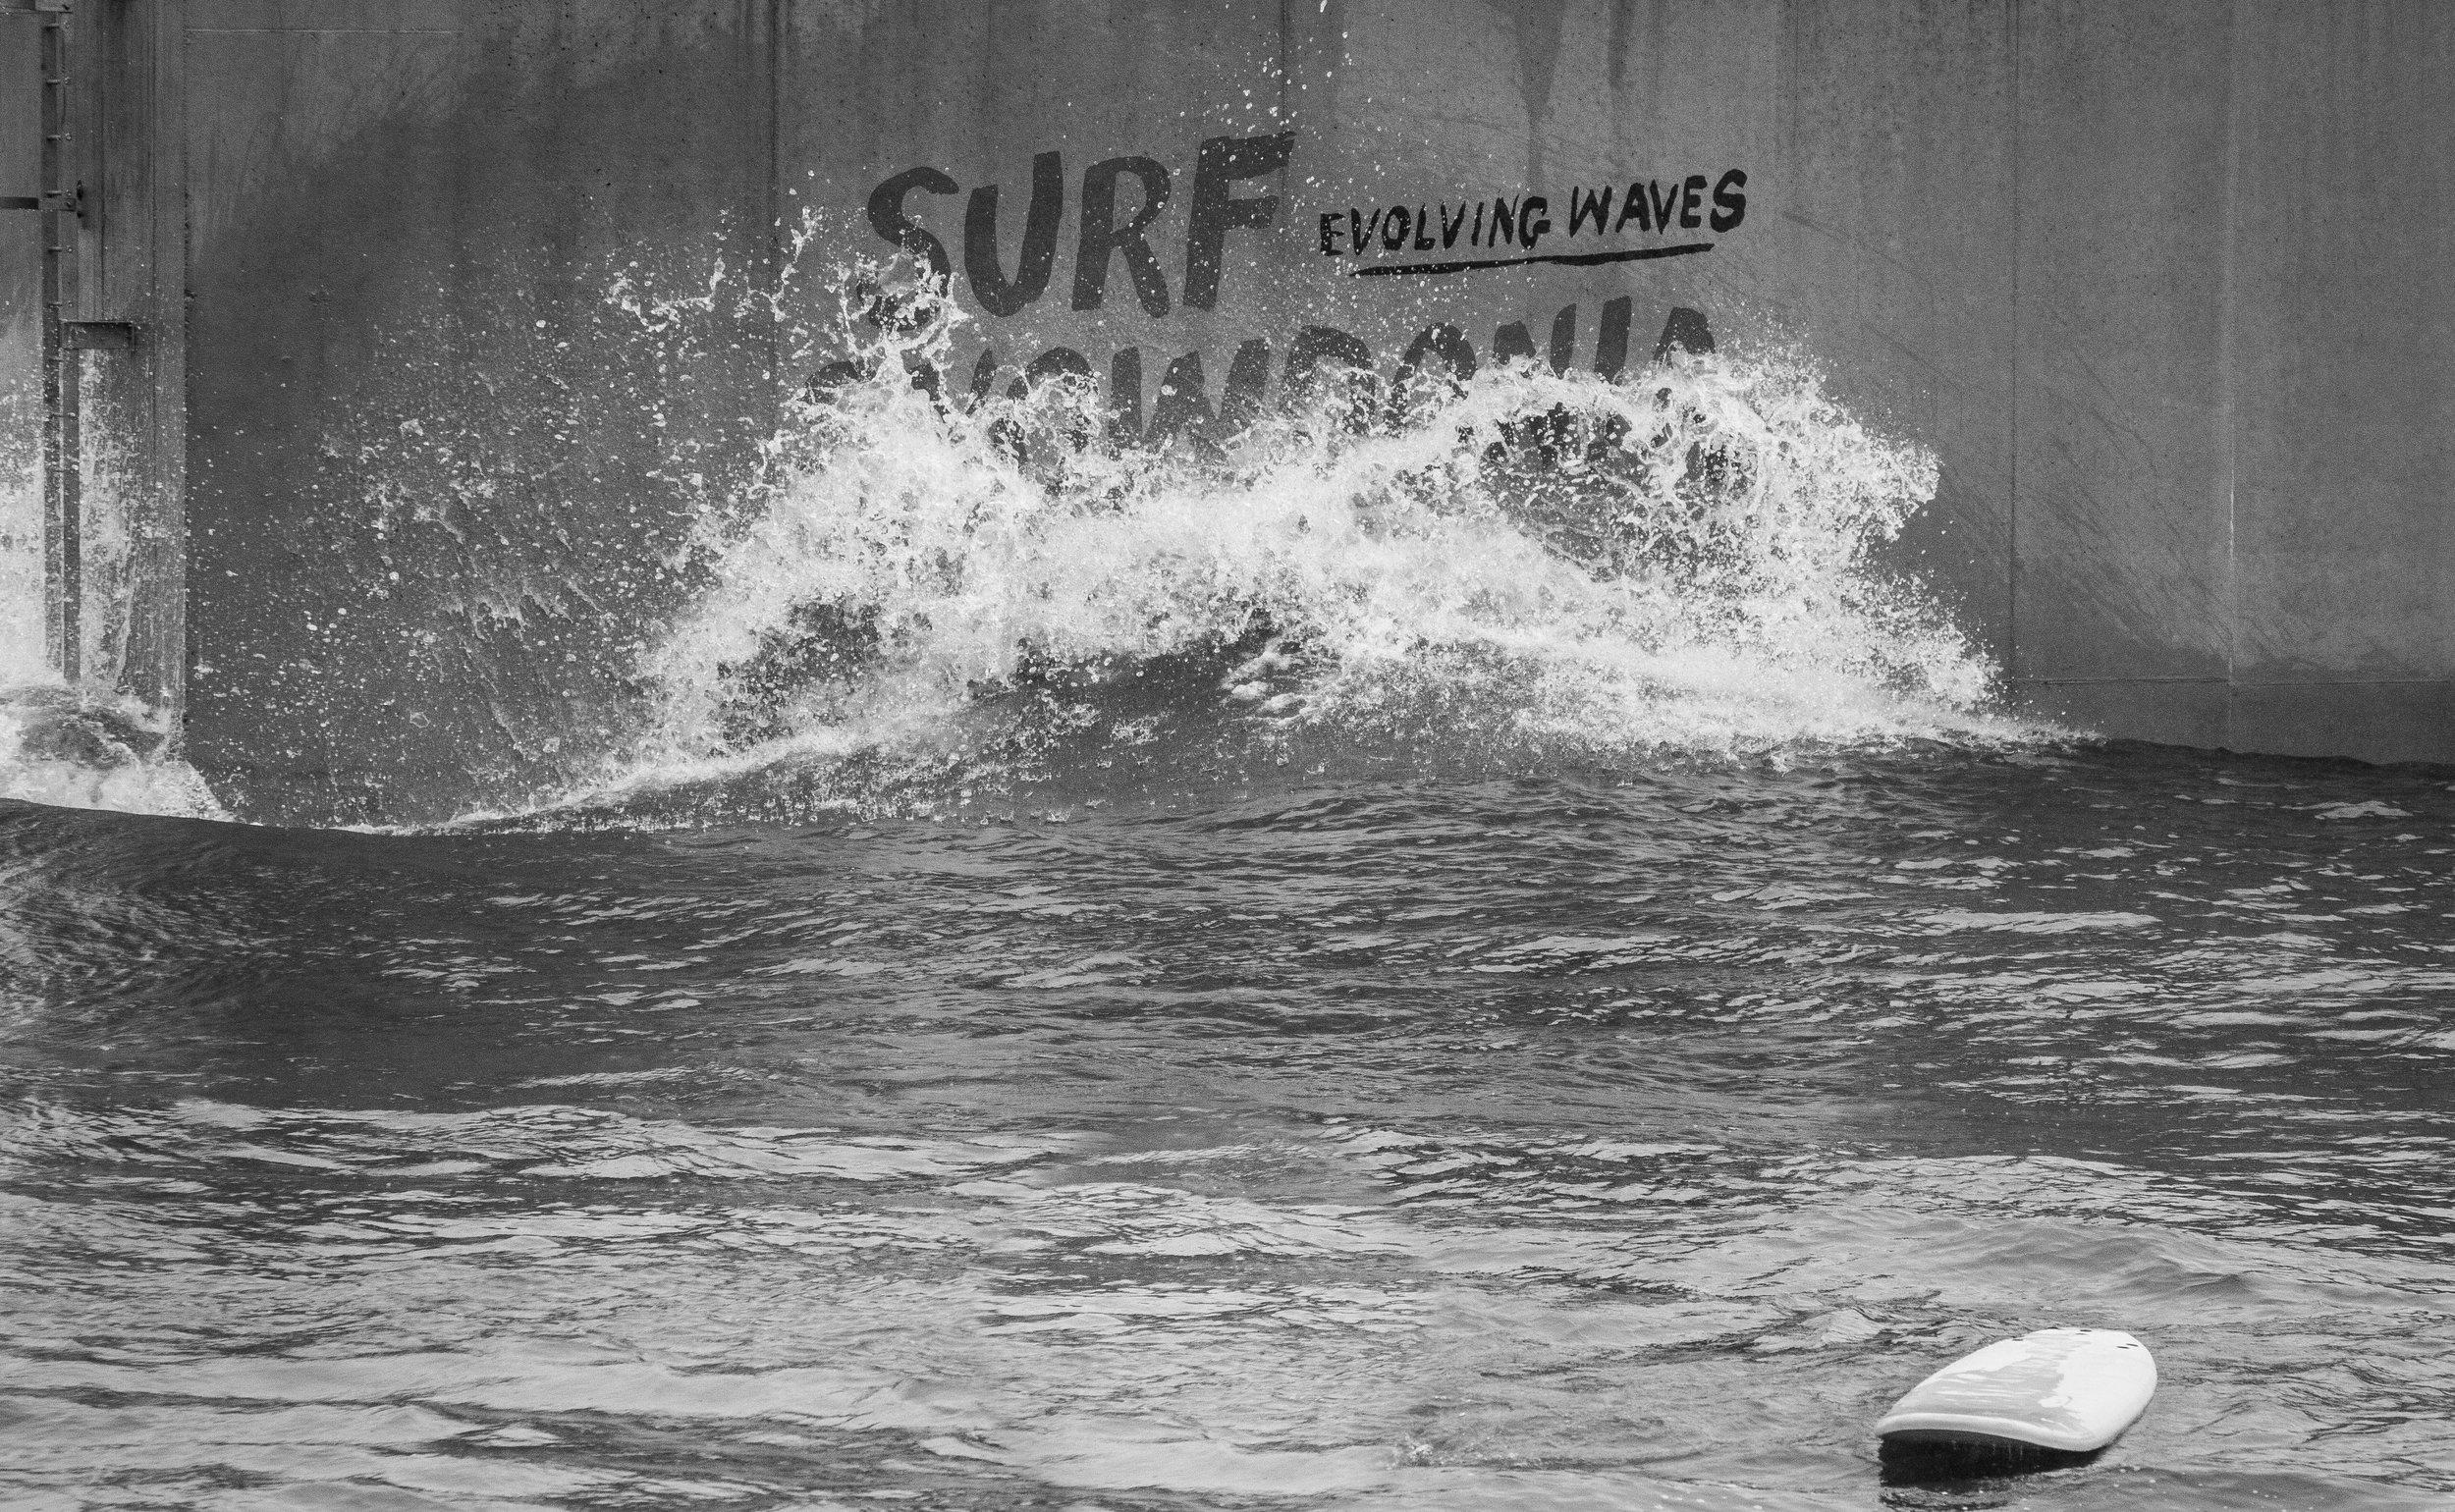 SurfSnowdonia